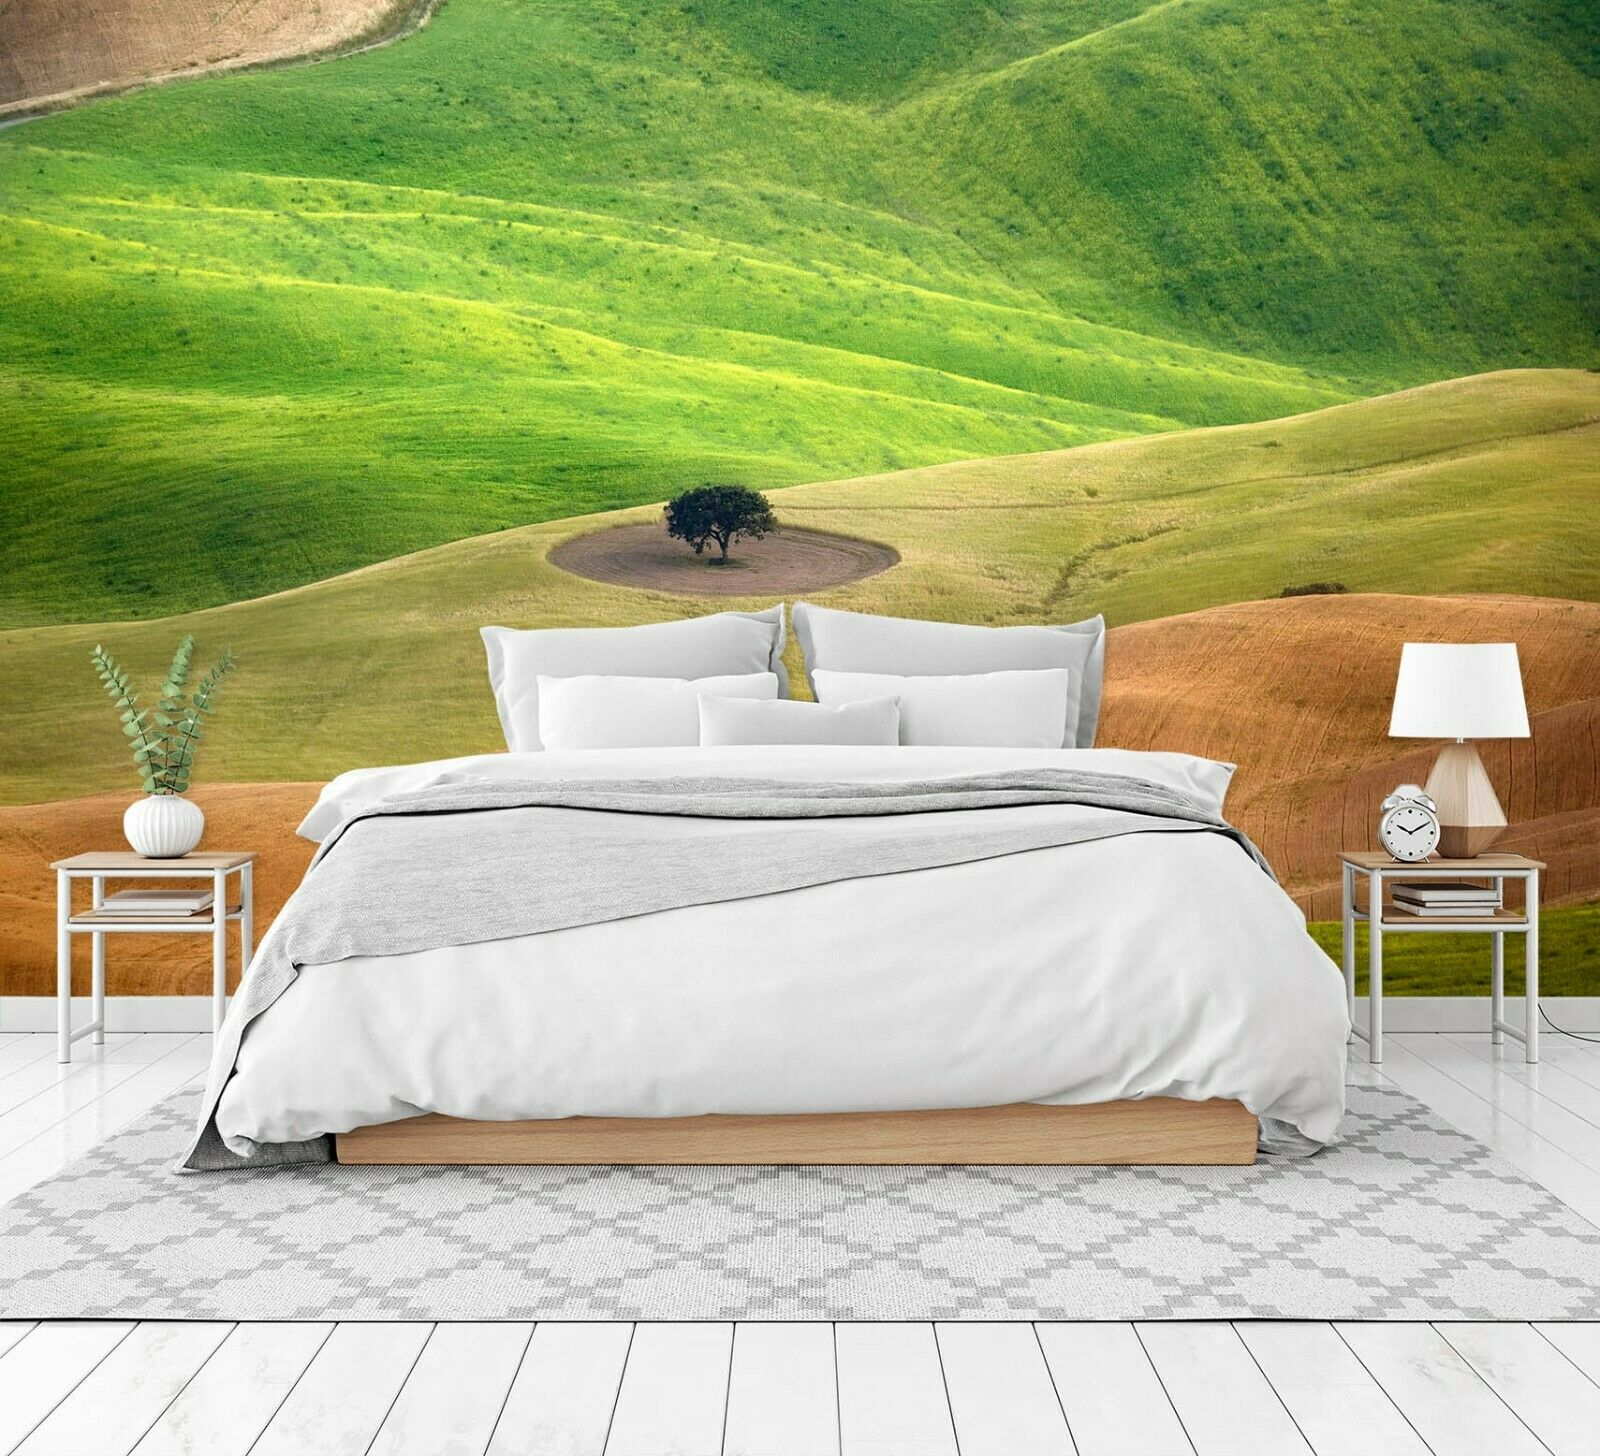 3D Grün Meadow N397 Wallpaper Wall Mural Self-adhesive Marco Carmassi Amy